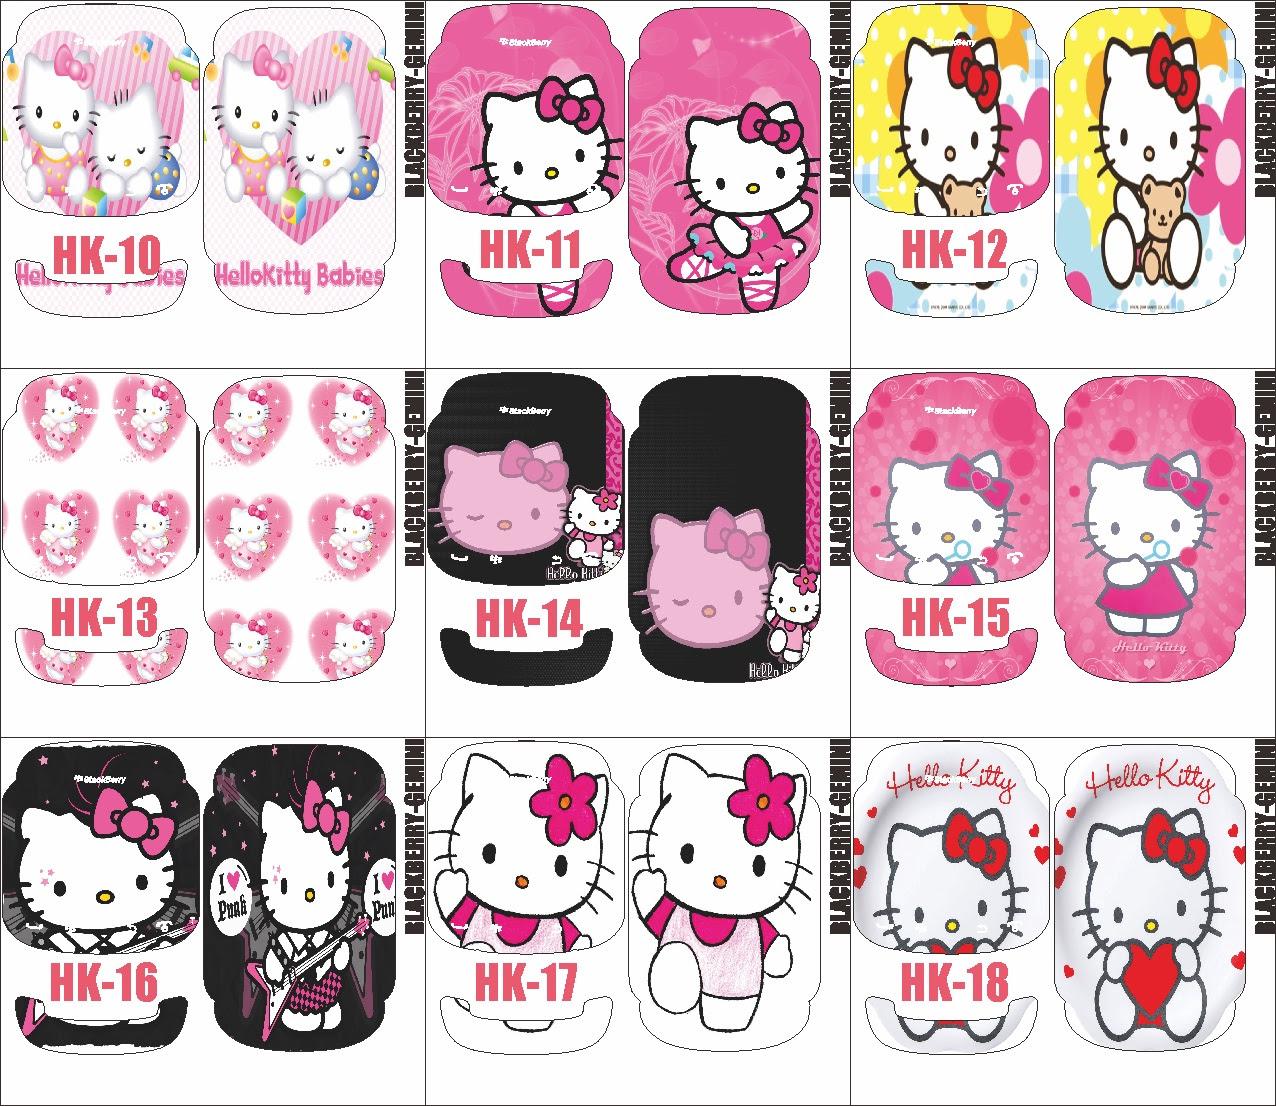 Gambar Wallpaper Hello Kitty Untuk Hp Android Terlengkap Gasebo